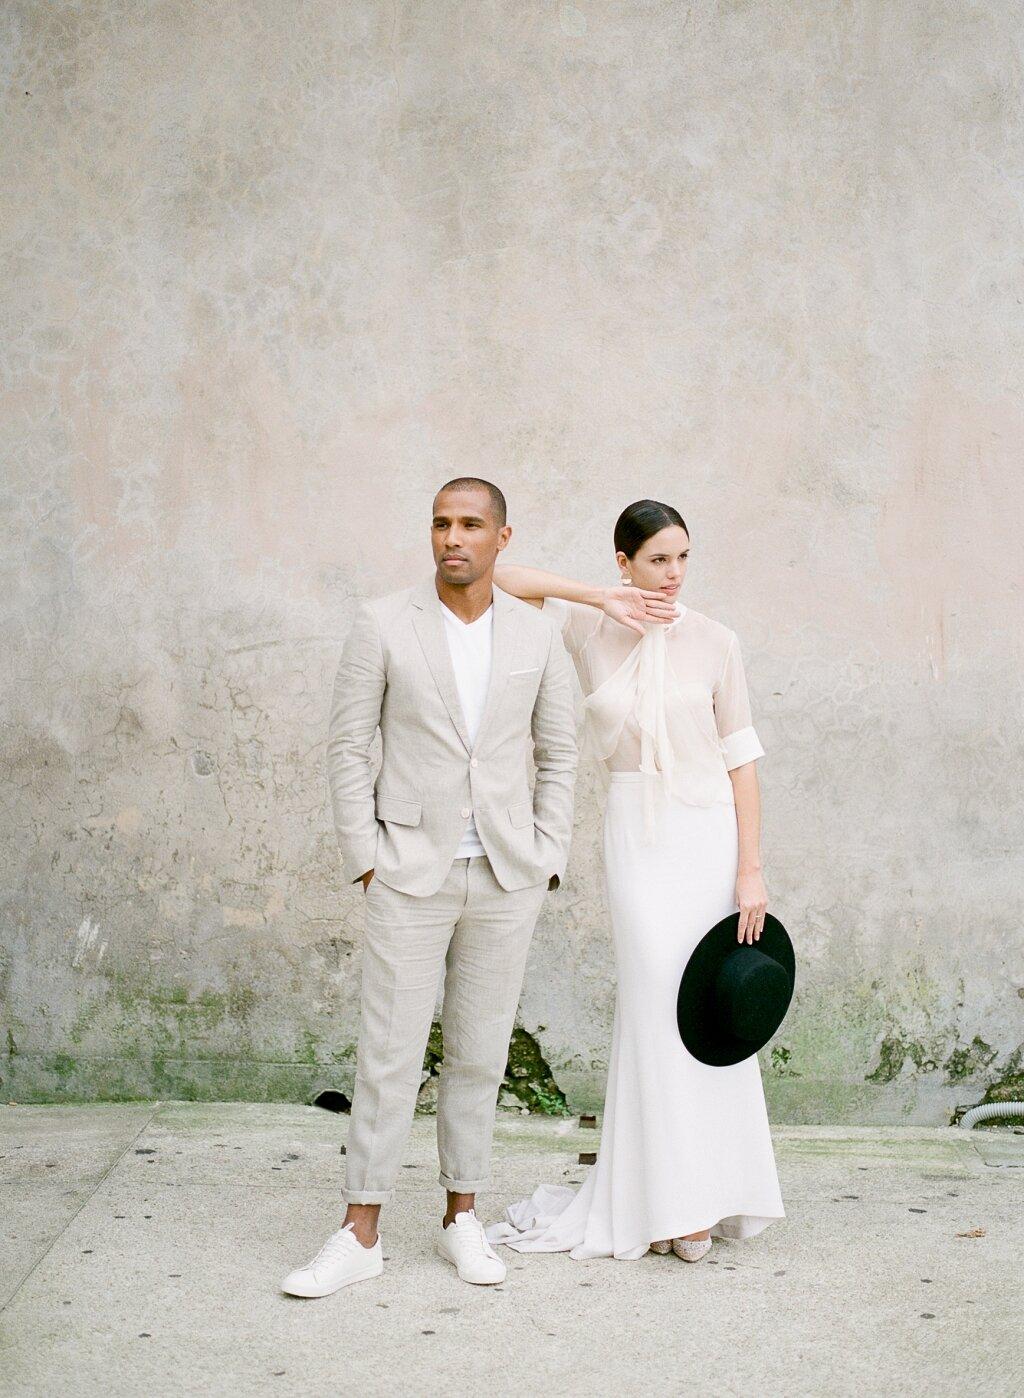 Fashion-engagement-shoot-Ravello-Italy-Amalfi Coast_Tanja Kibogo (1a) (2).JPG